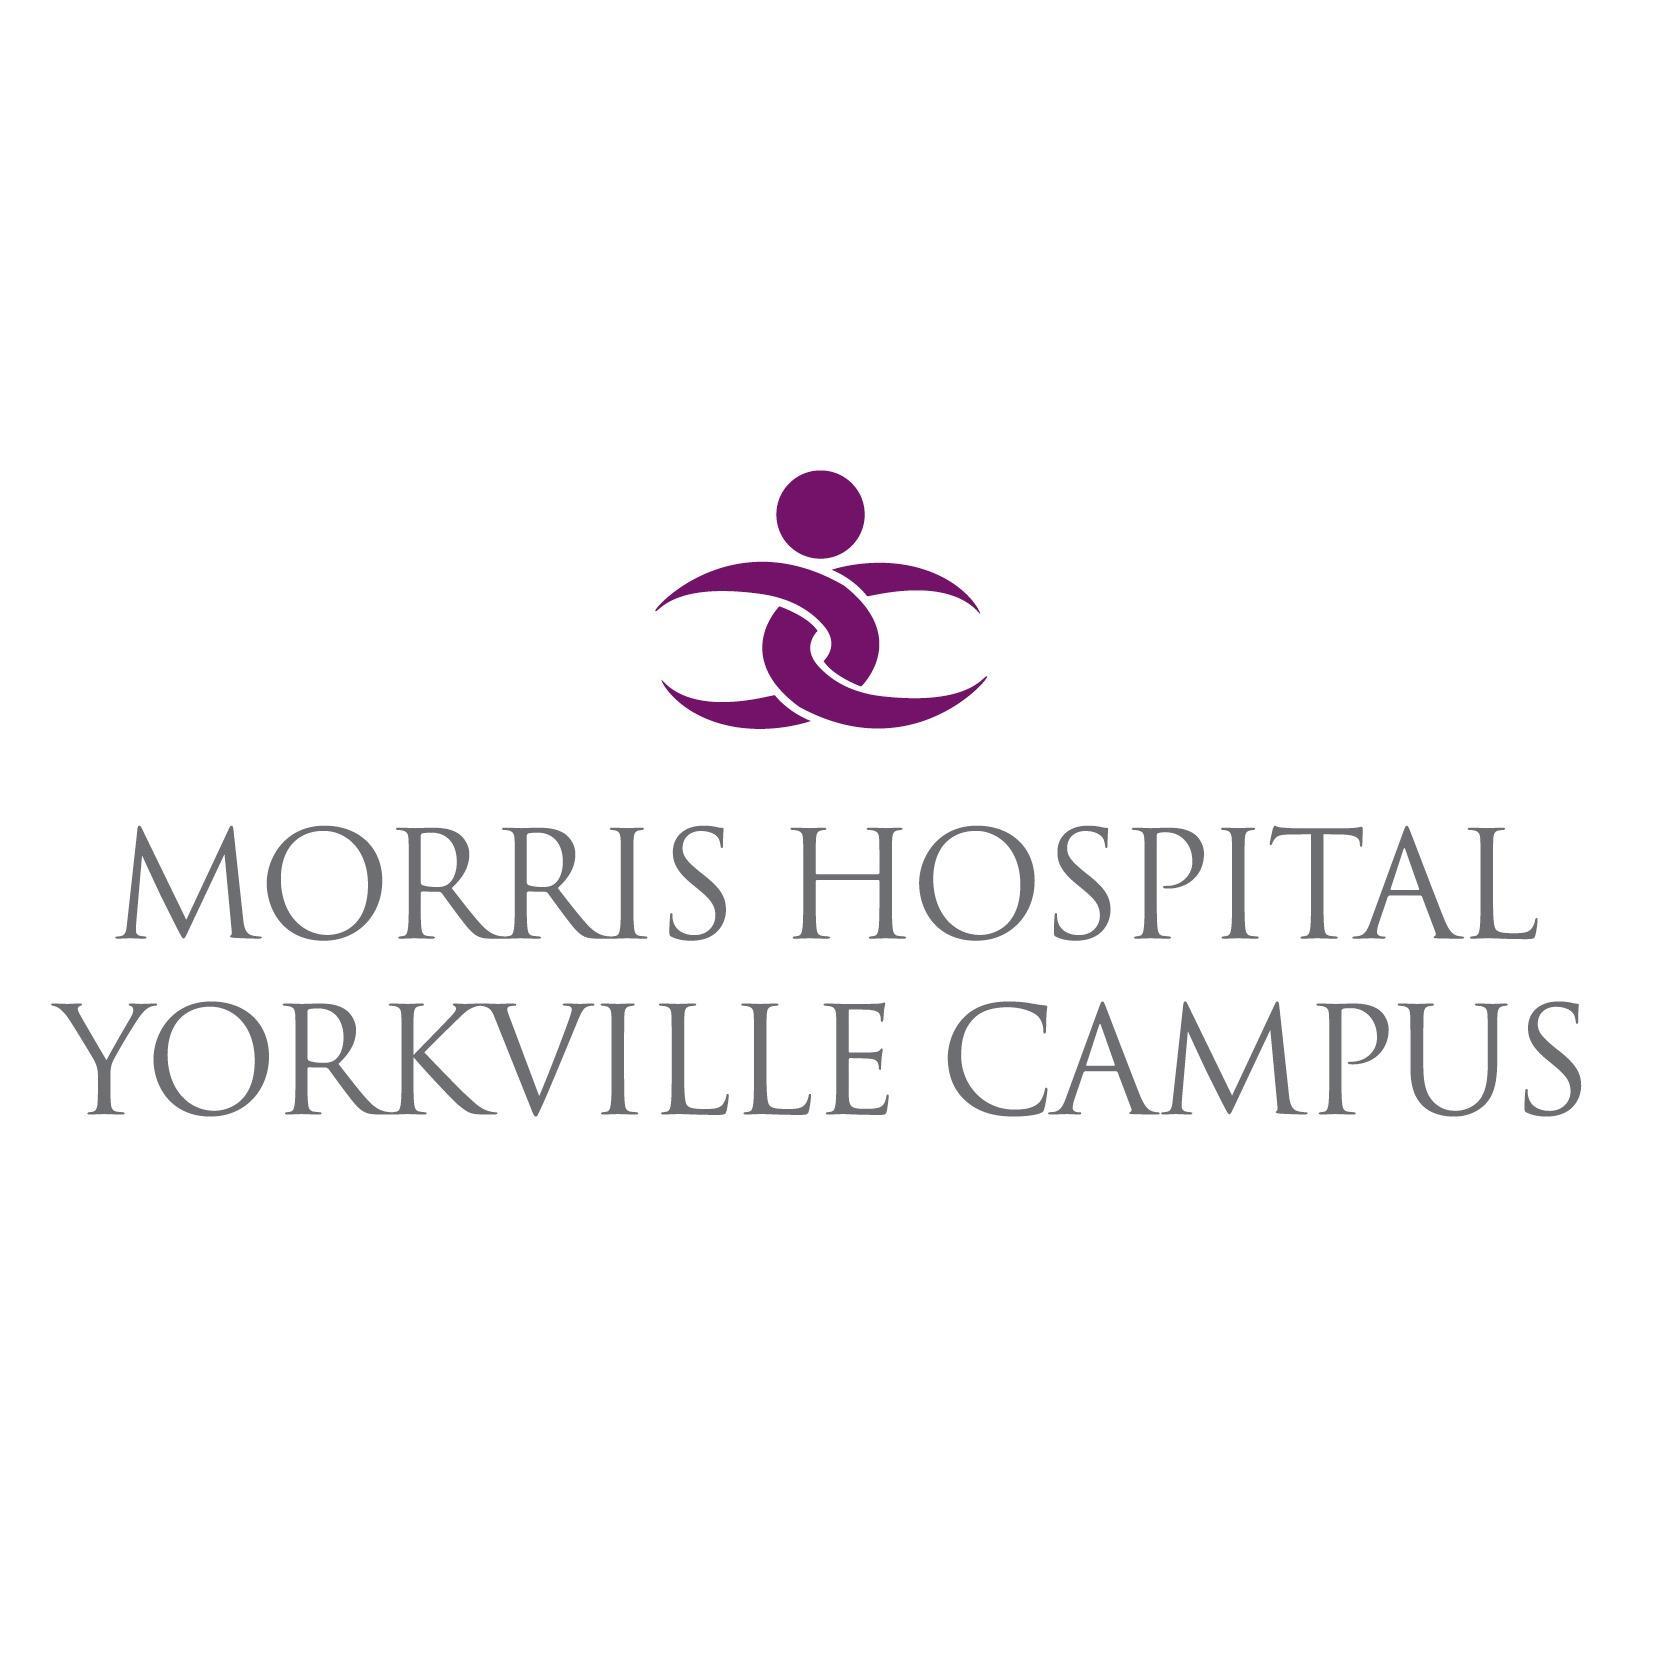 Morris Hospital Yorkville Campus